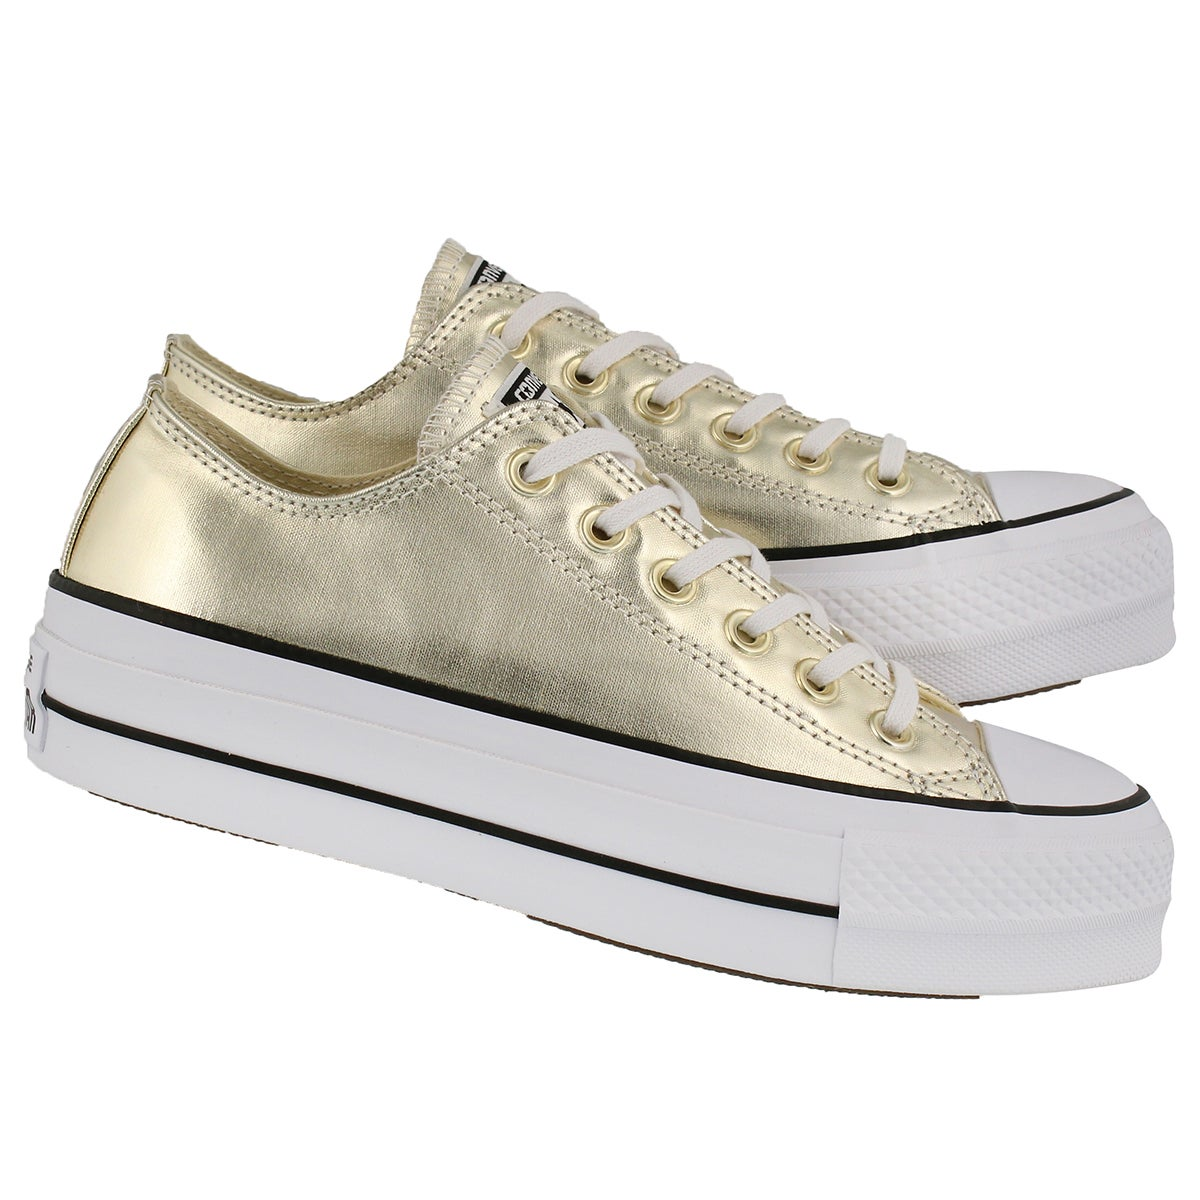 Lds CT AS Lift Mtlc slv platform sneaker